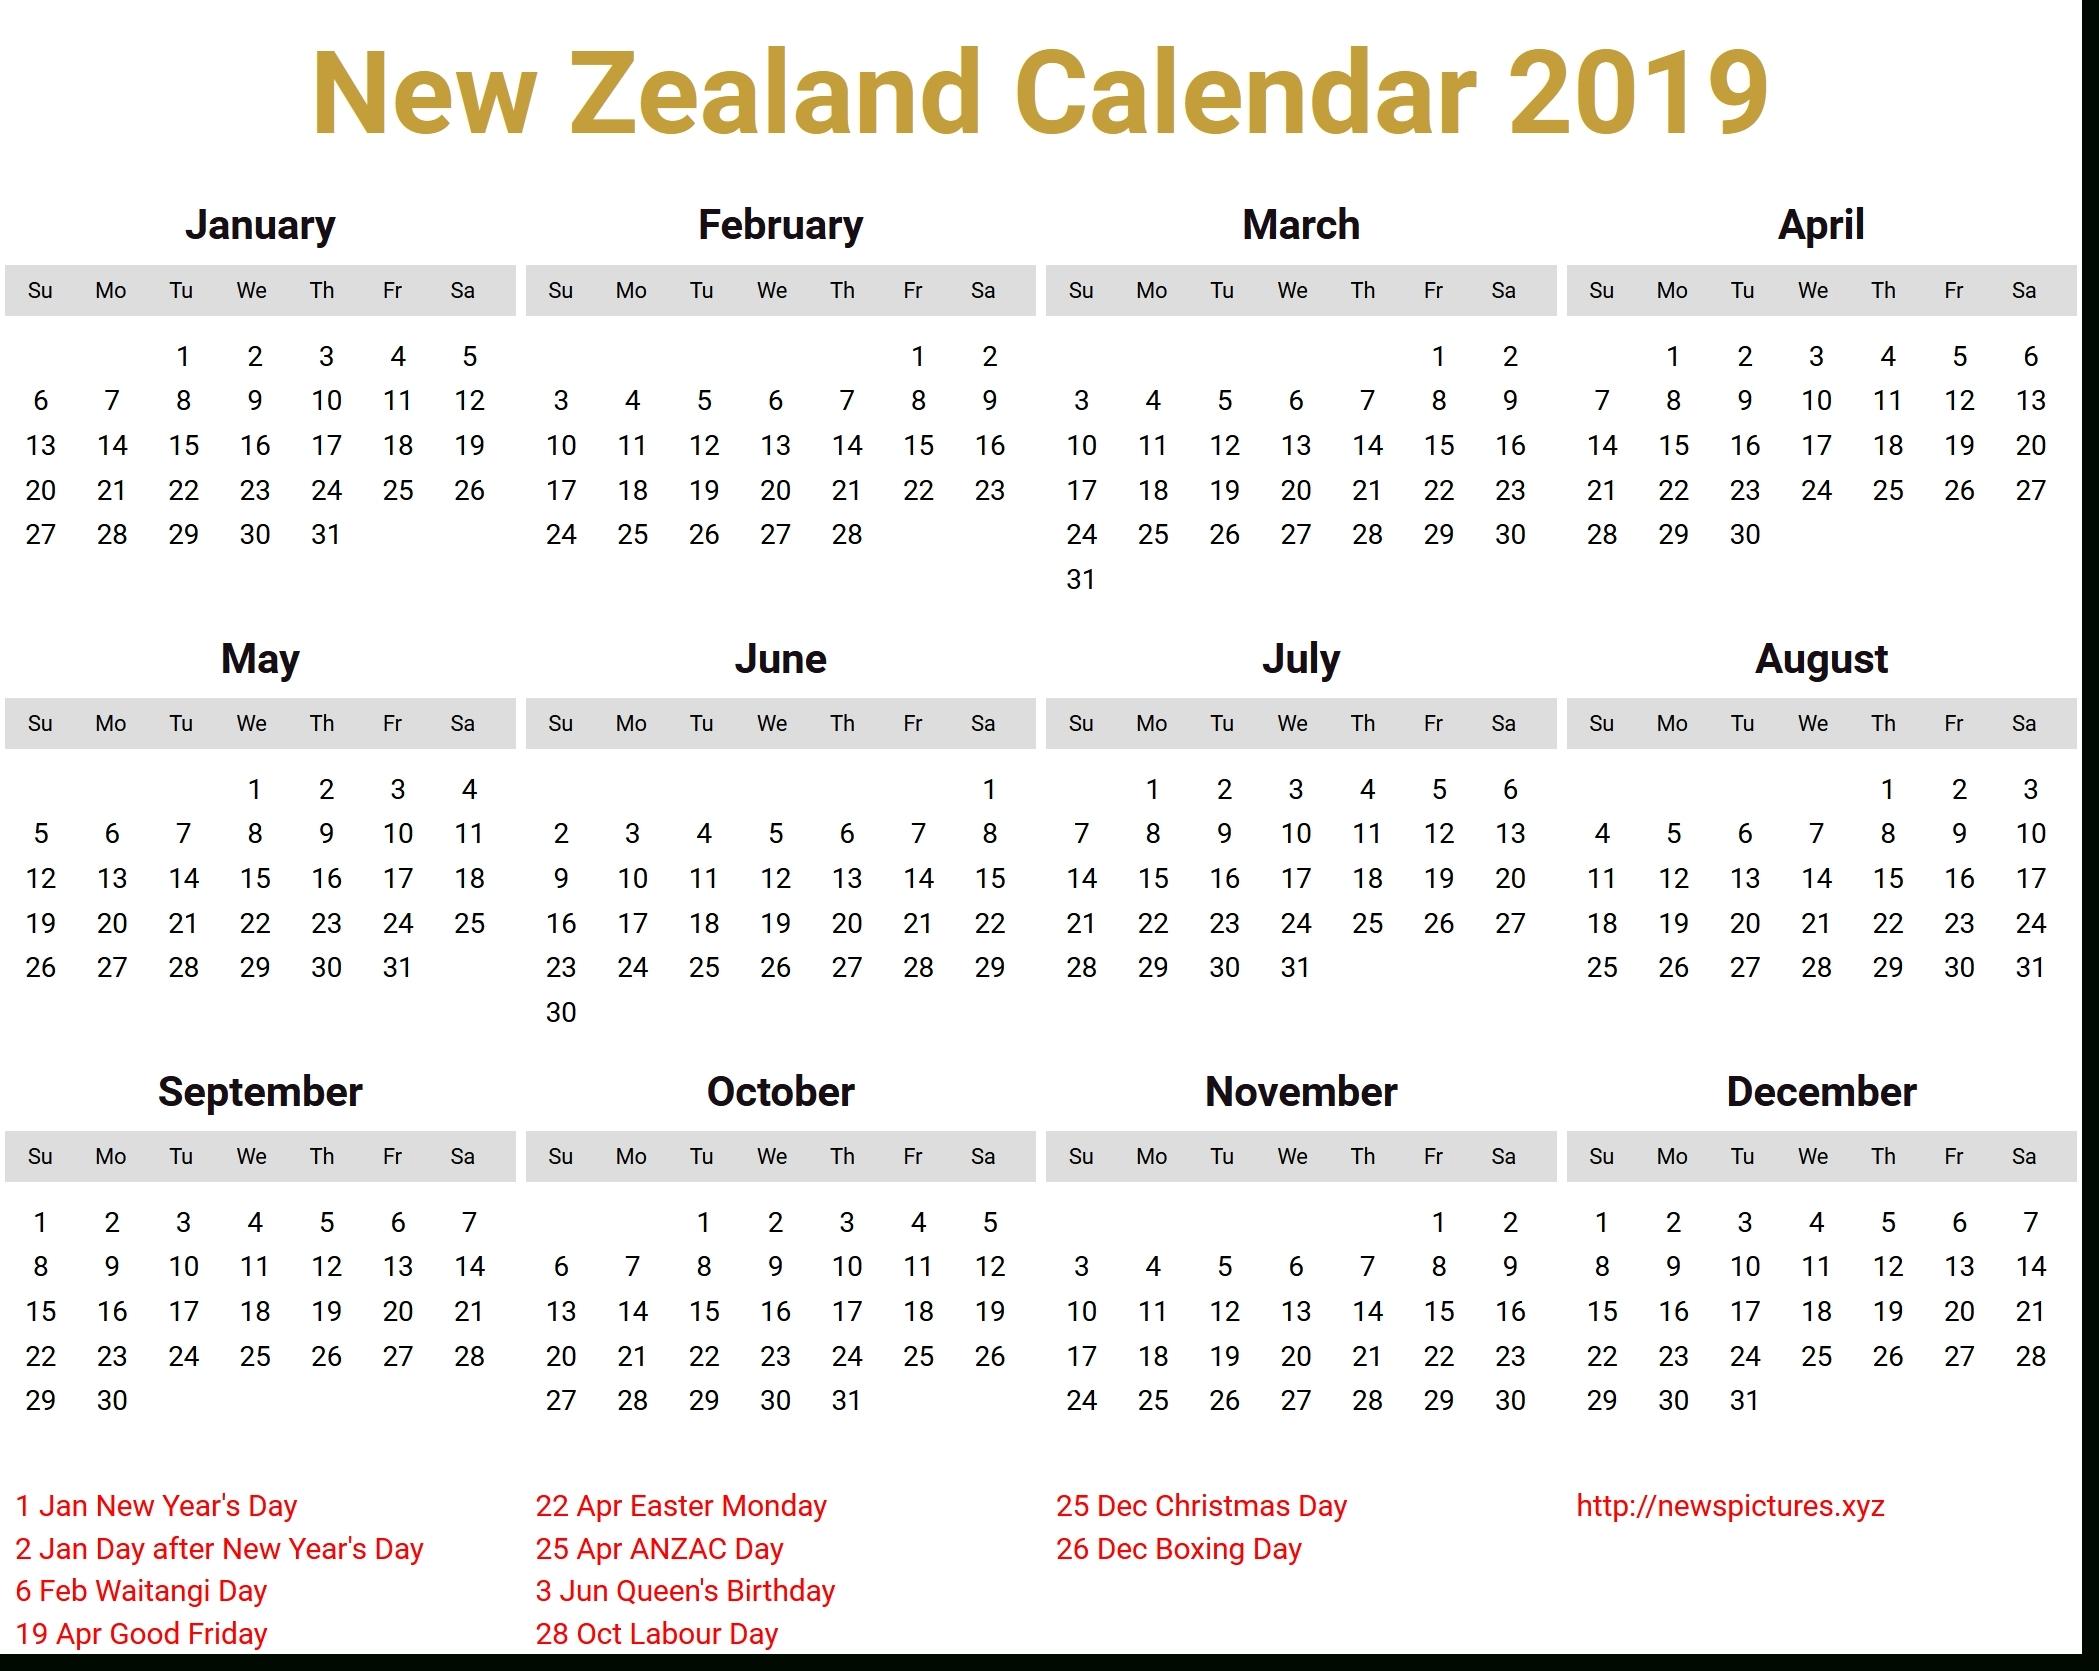 December 2019 Calendar Nz Holidays • Printable Blank Calendar Template Apple Calendar Nz Holidays